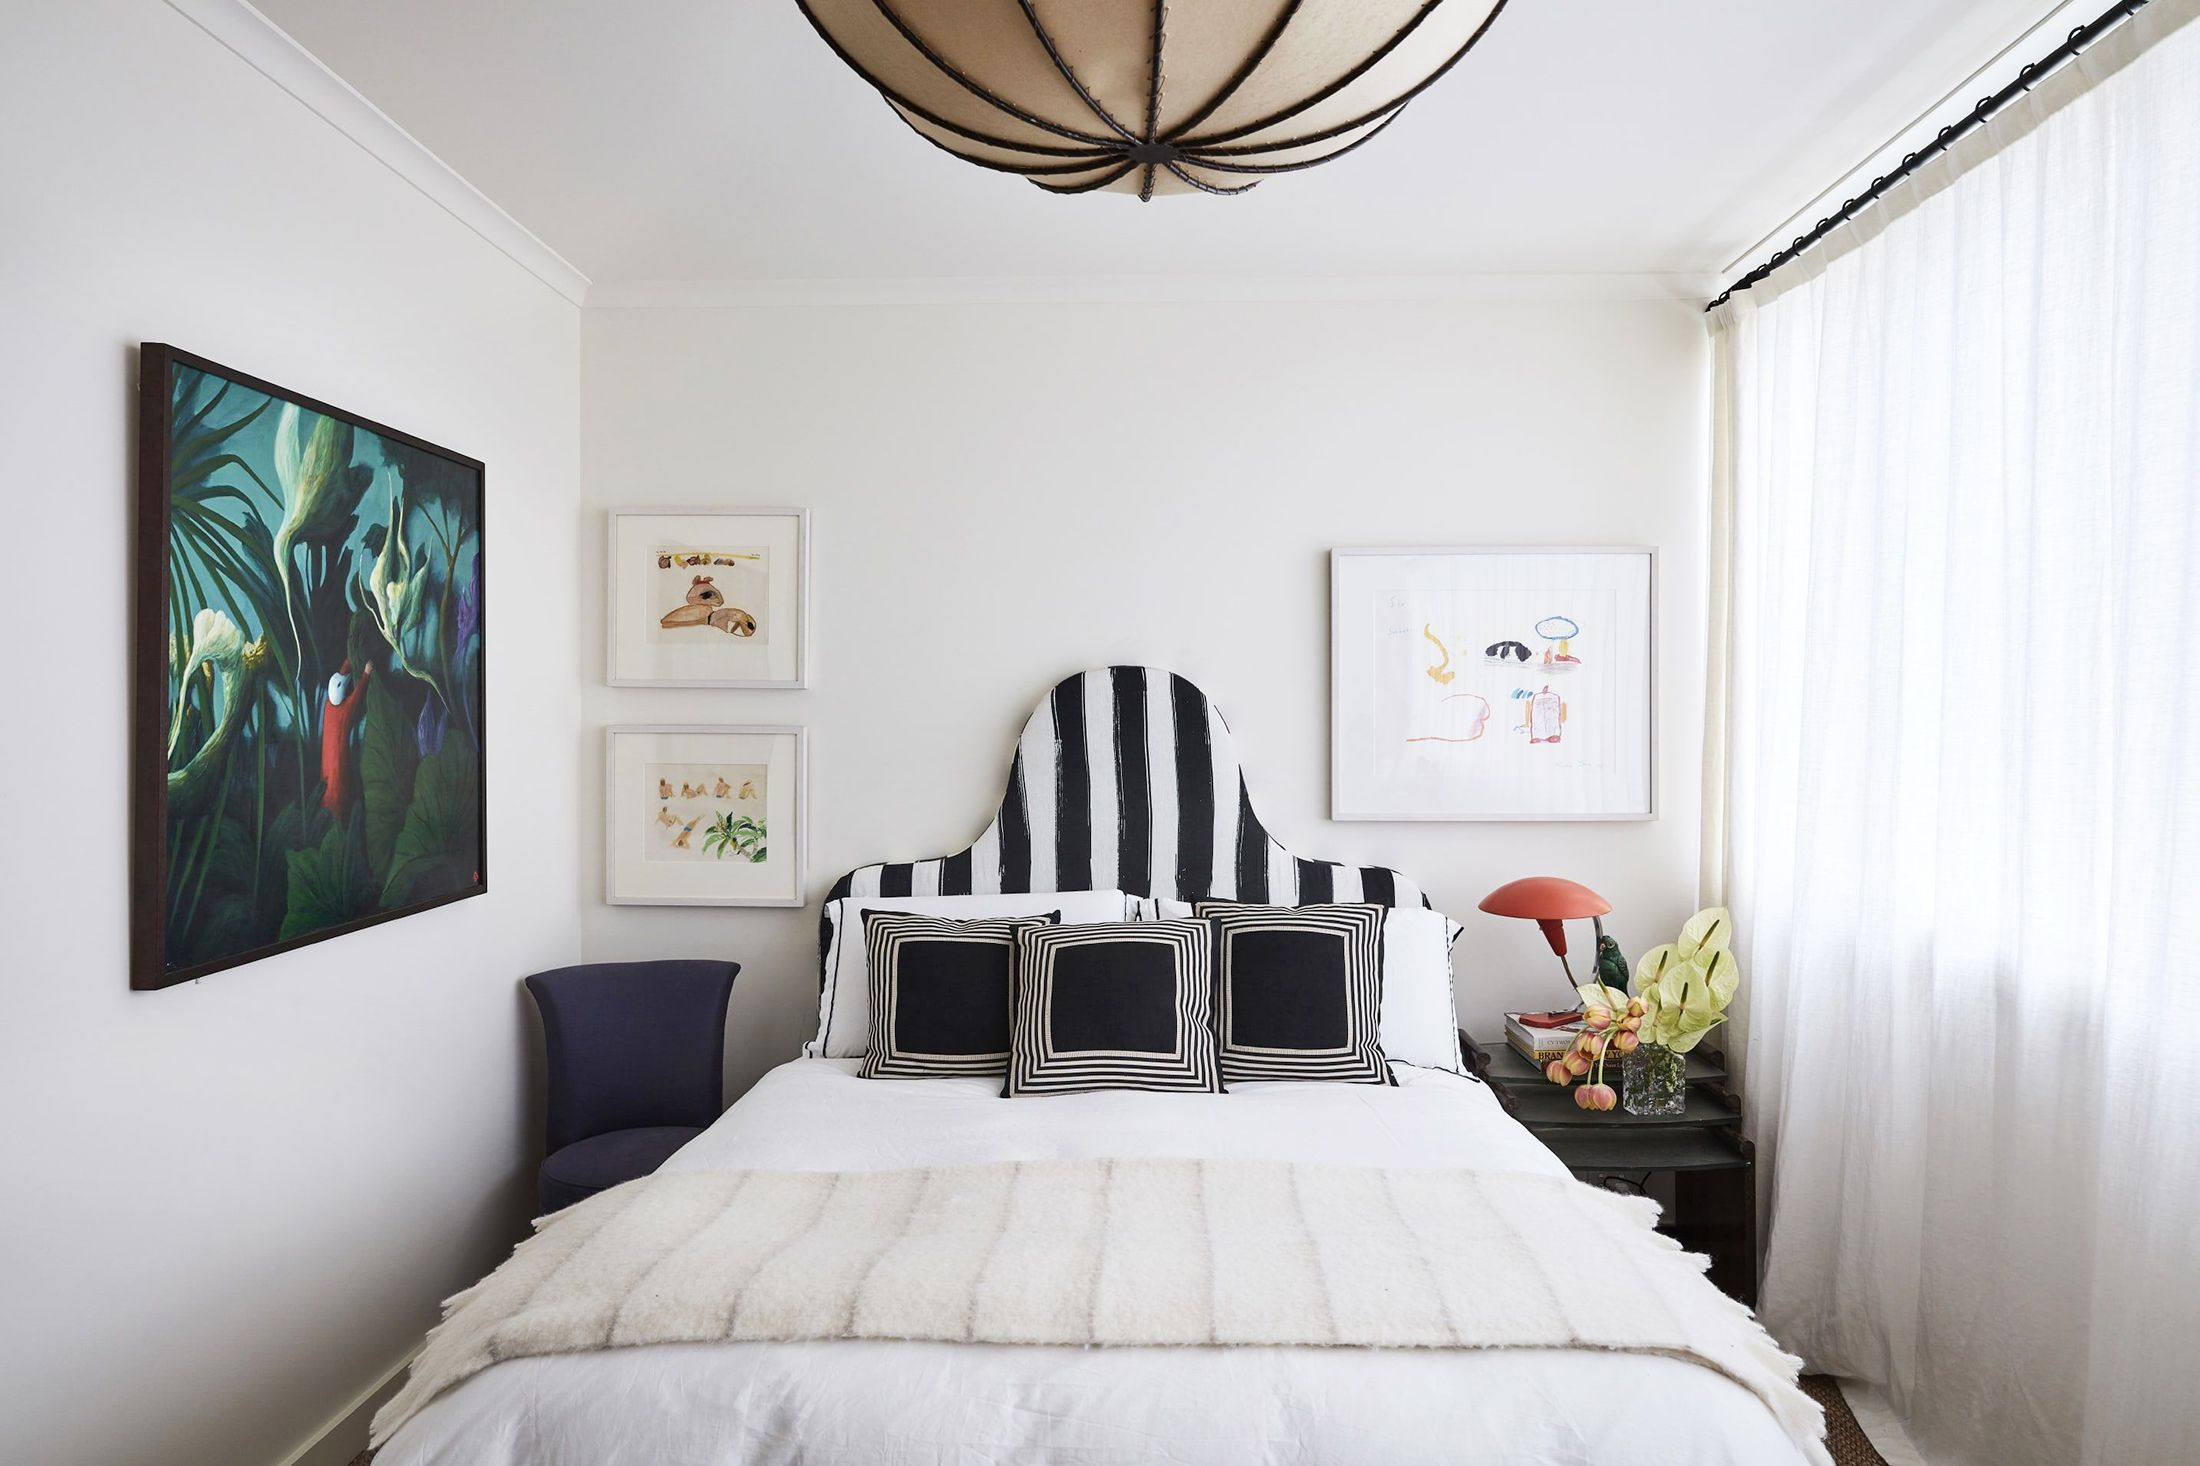 19 Best Bedroom Wall Decor Ideas In 2021 Bedroom Wall Decor Inspiration